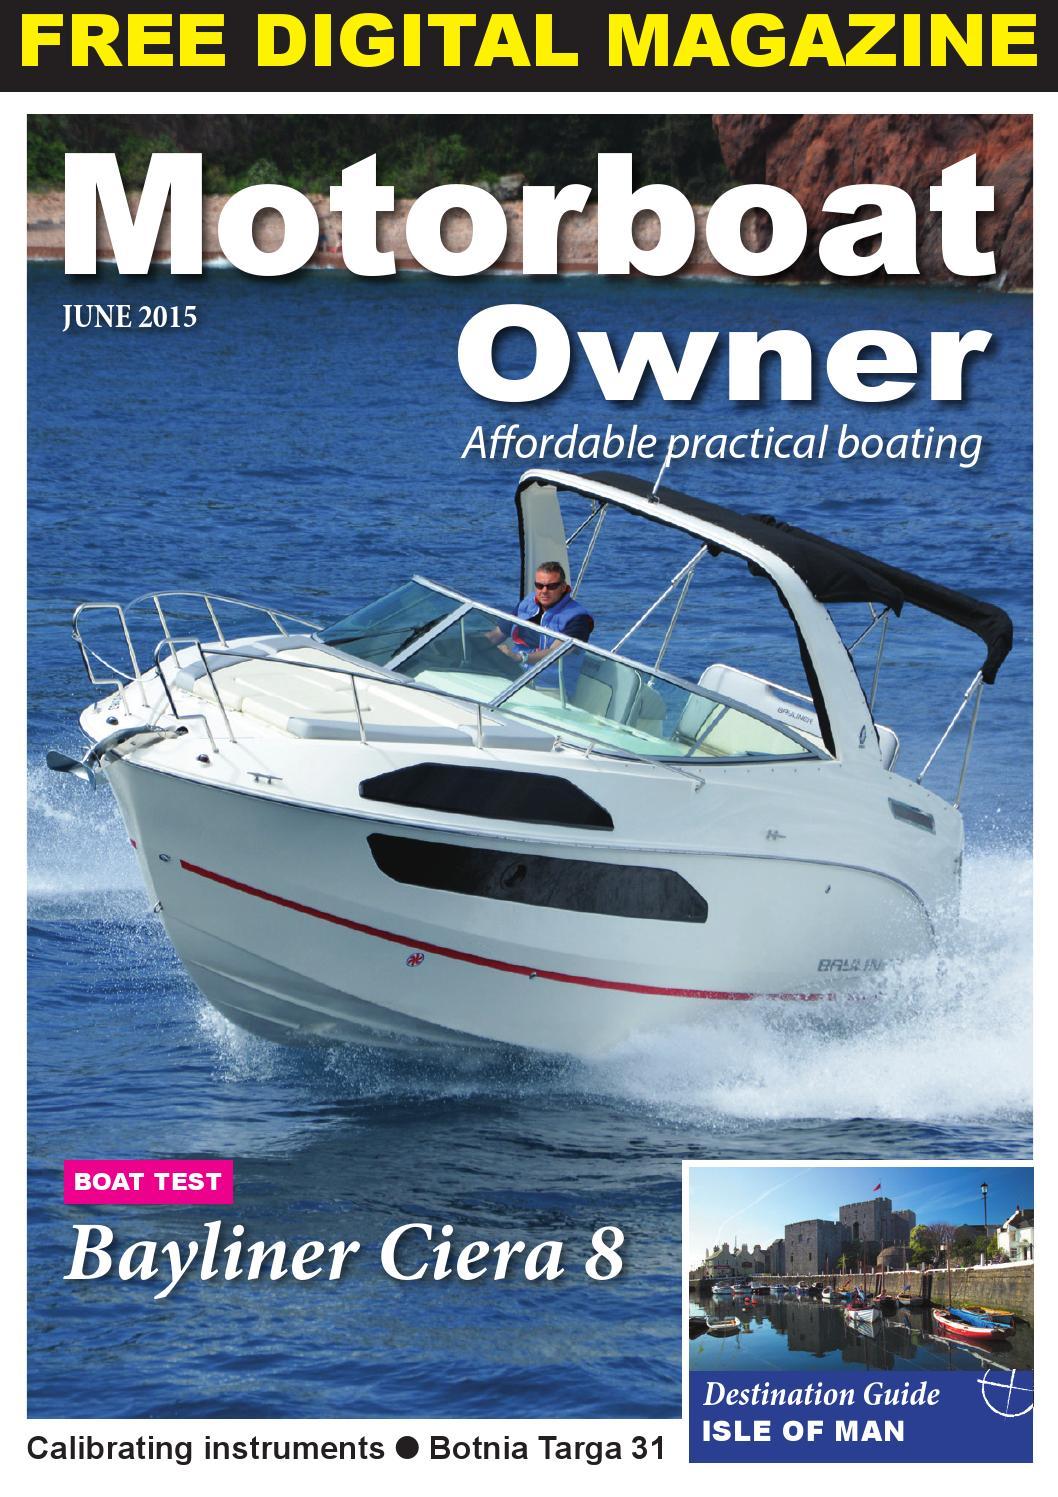 Motorboat Owner June 2015 By Digital Marine Media Ltd Issuu Sea Ray Boat Wiring Diagram Inverter